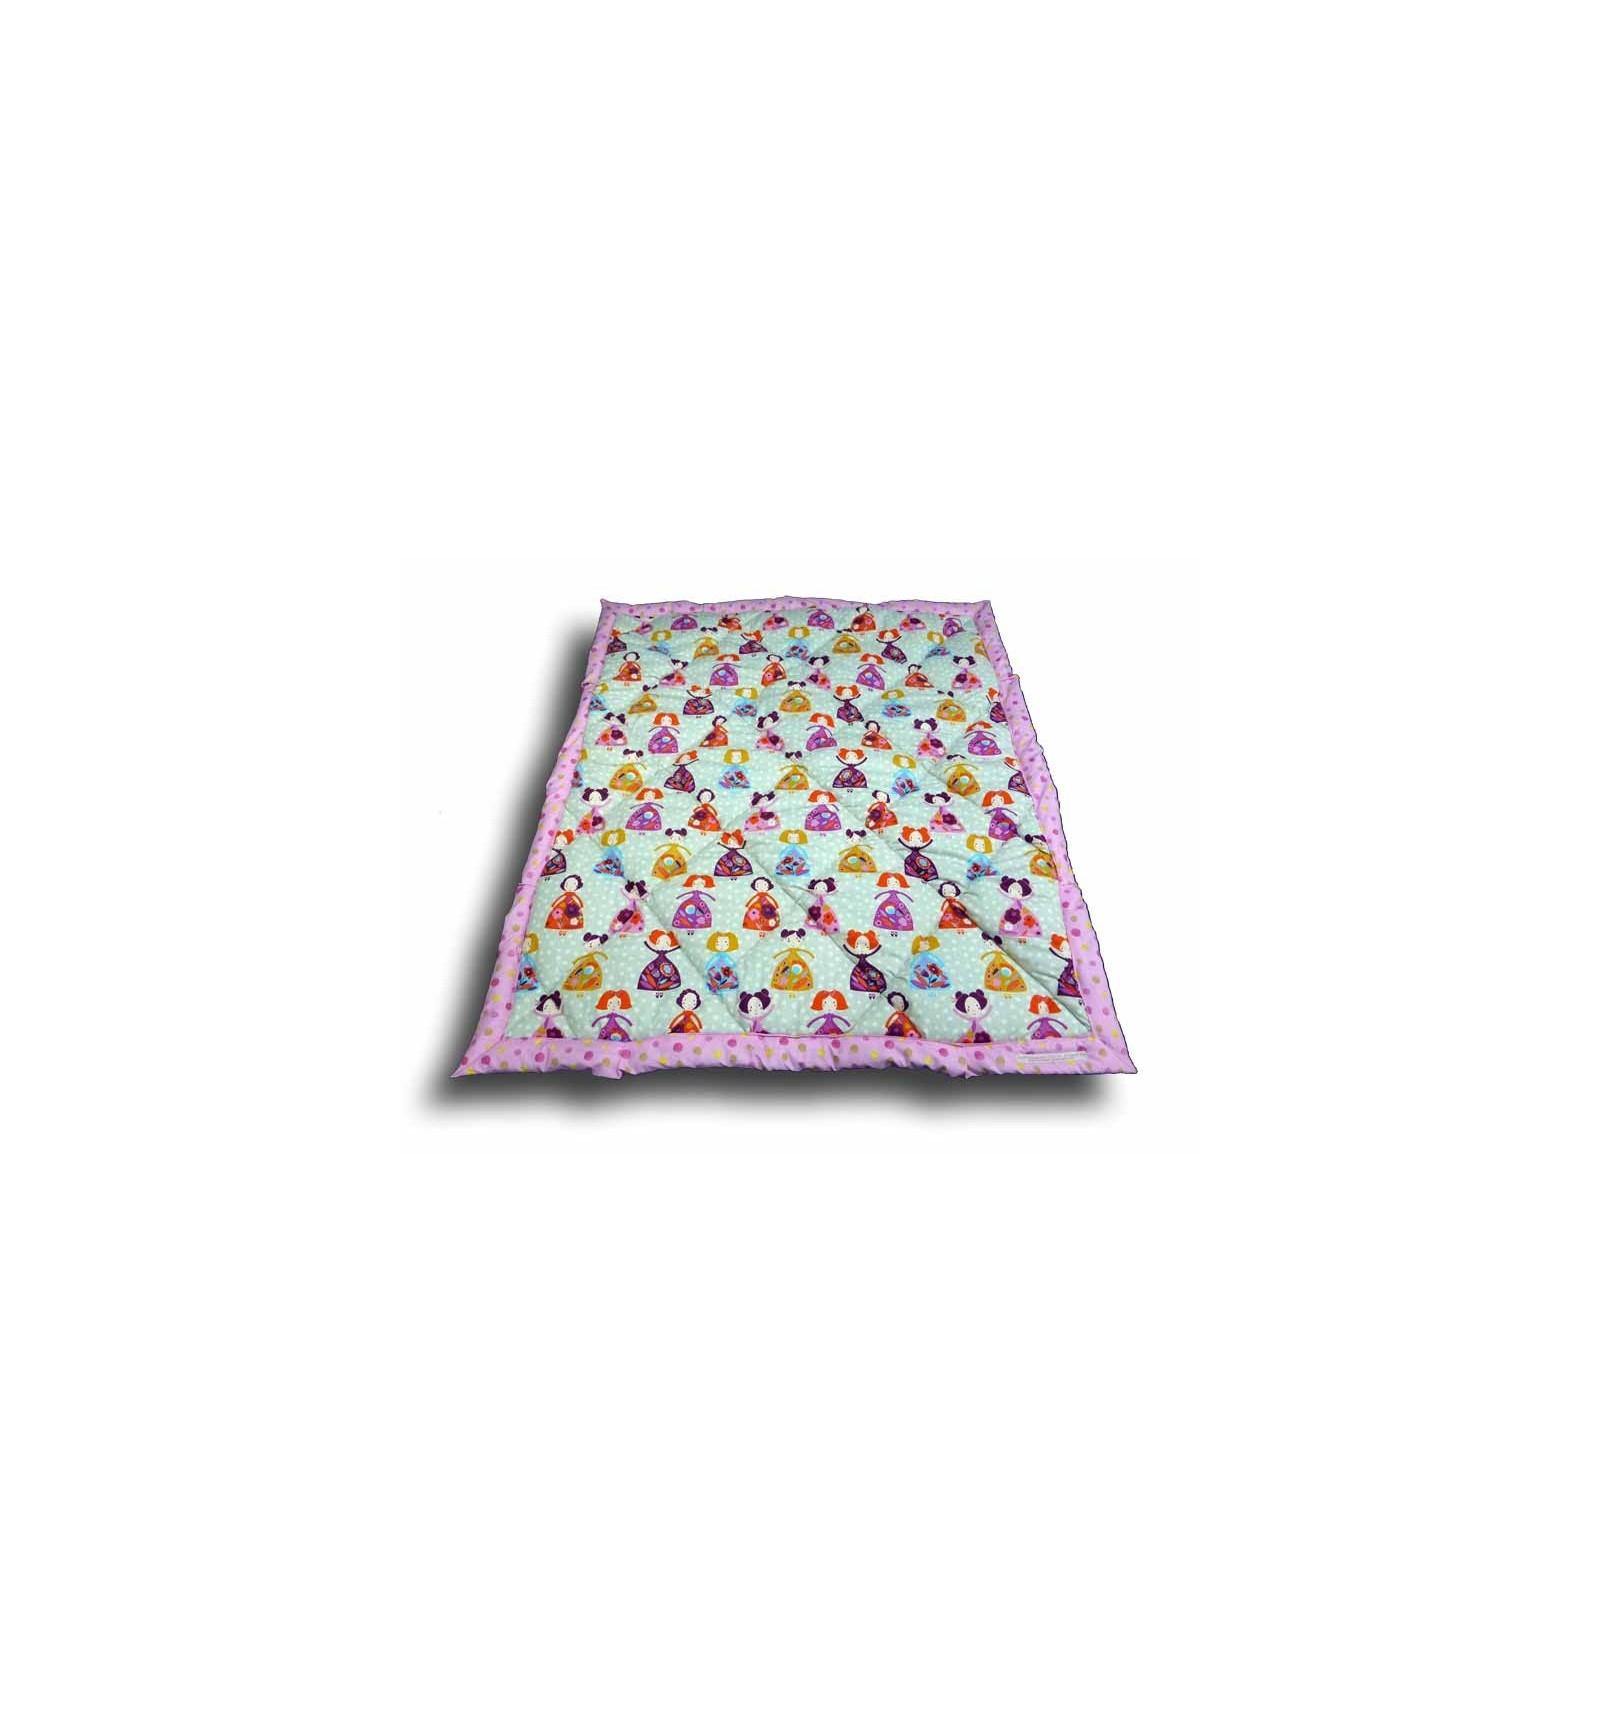 edredon couvre lit enfant edredon 100x120 cm motif. Black Bedroom Furniture Sets. Home Design Ideas